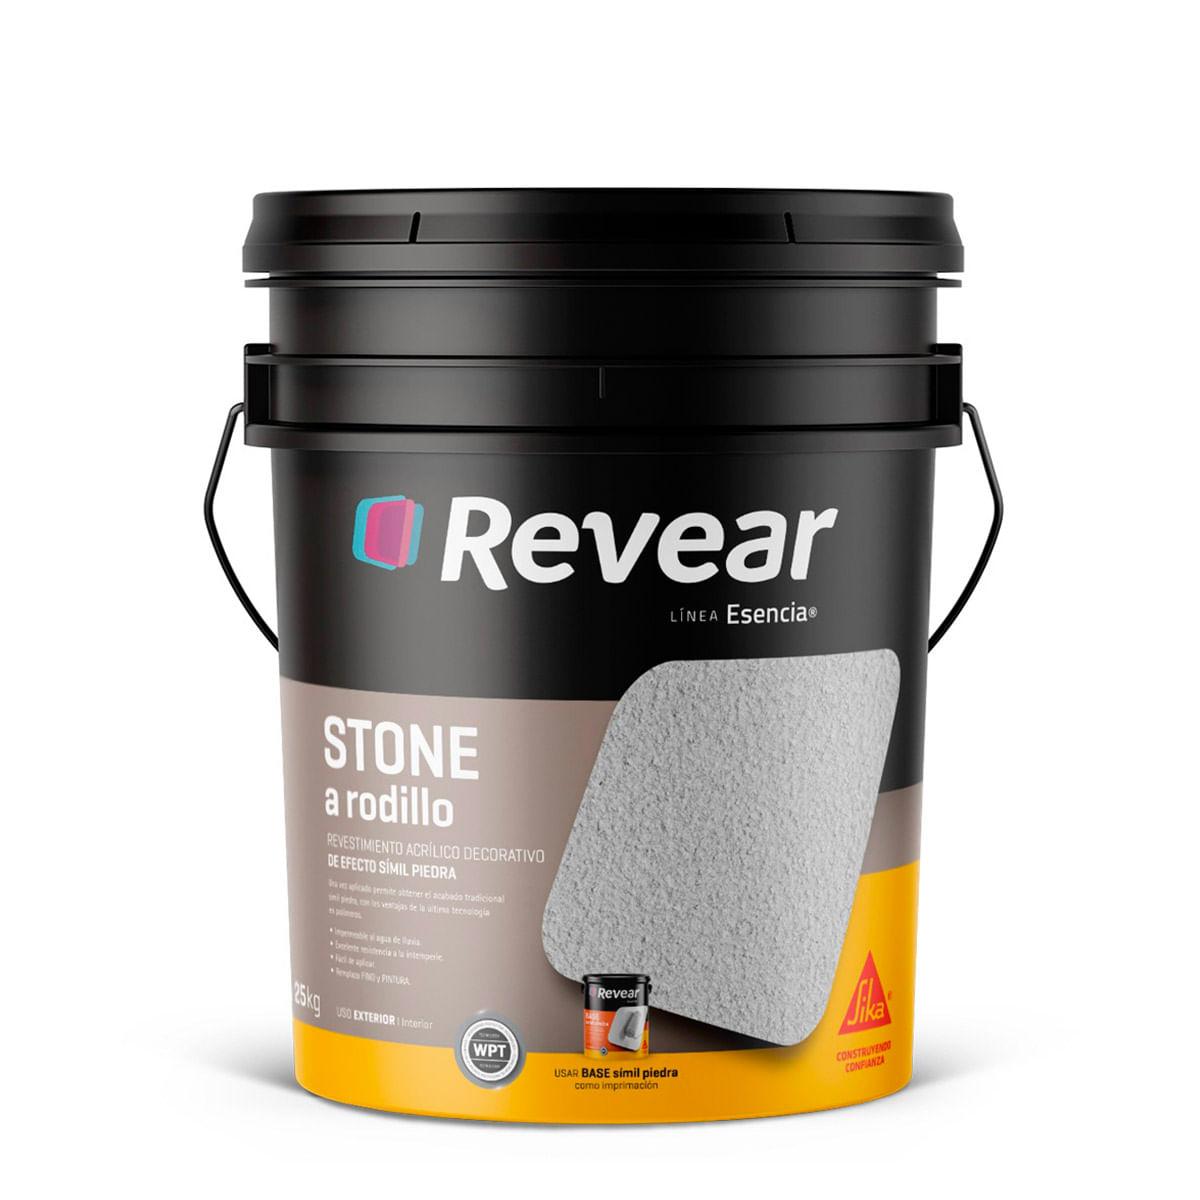 stone-rodillo-revestimiento